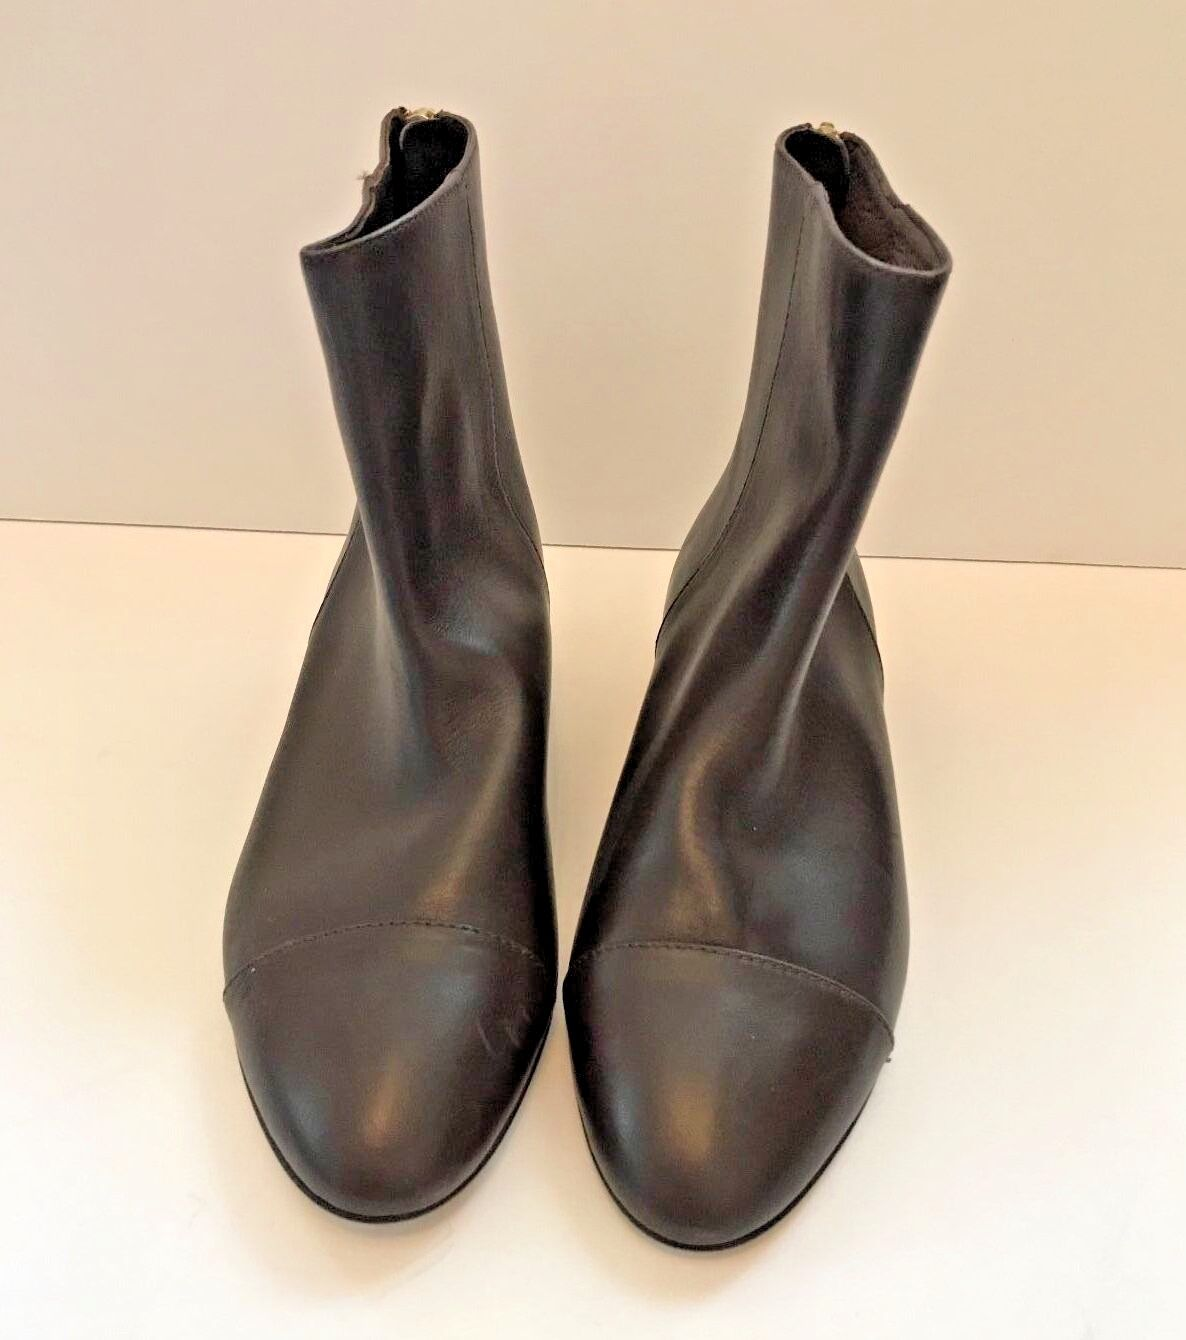 J. Crew läder Back Zip Ankle stövlar stövlar stövlar - Chocolate bspringaaa Storlek 7 (MSRP  298)  billig grossist